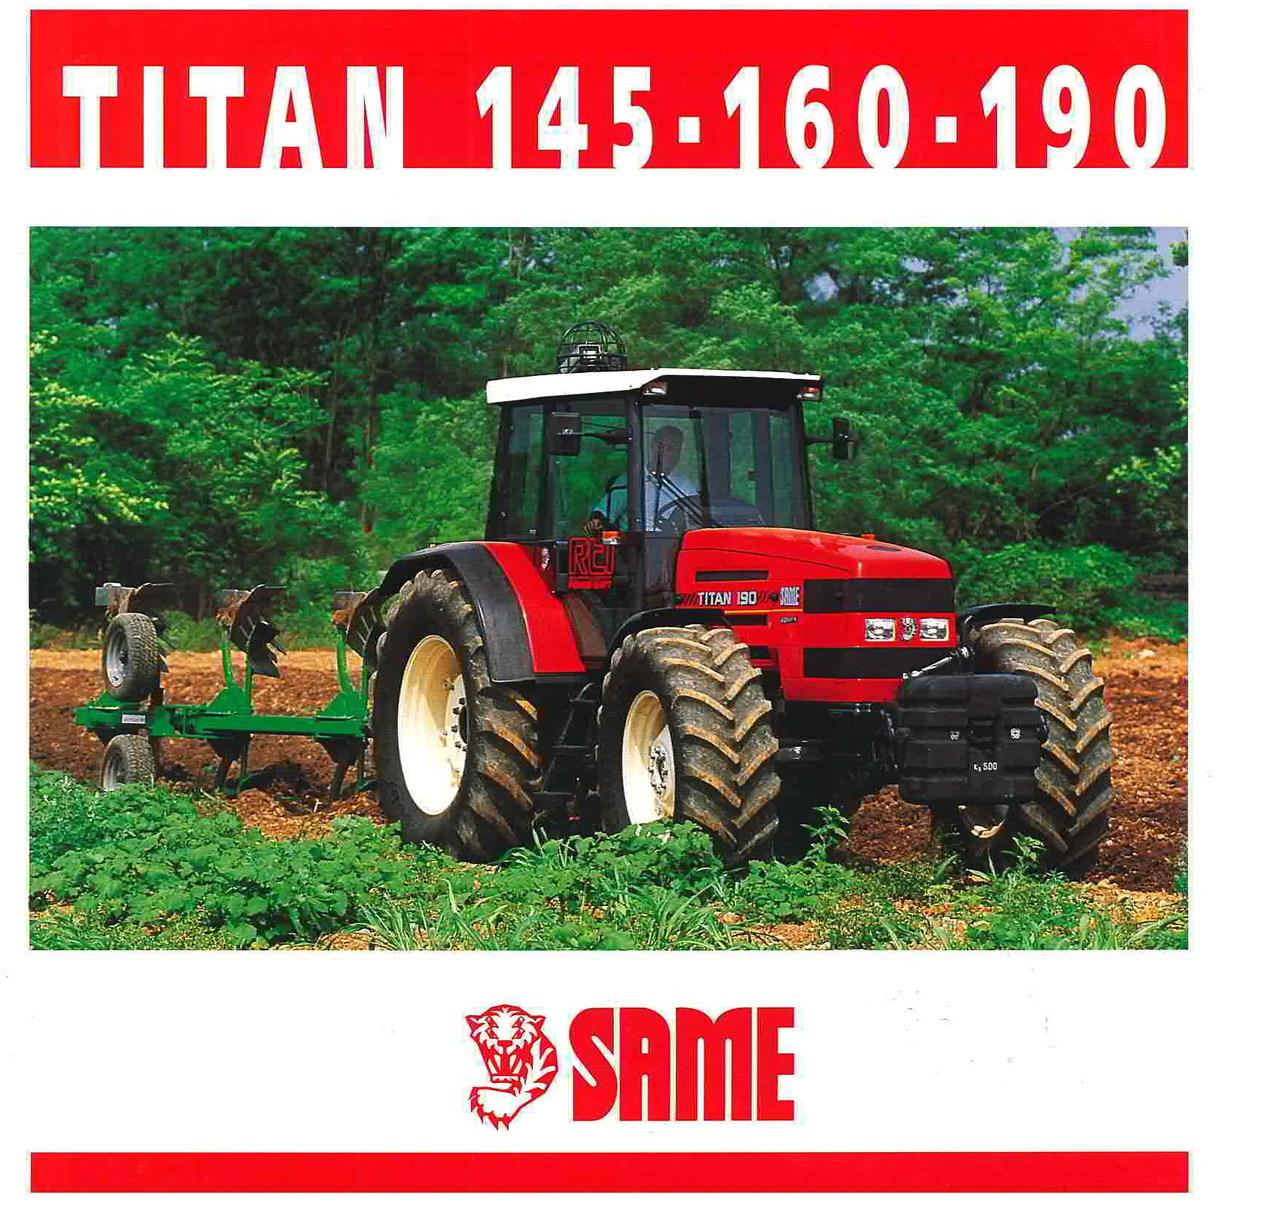 TITAN 145 - 160 - 190